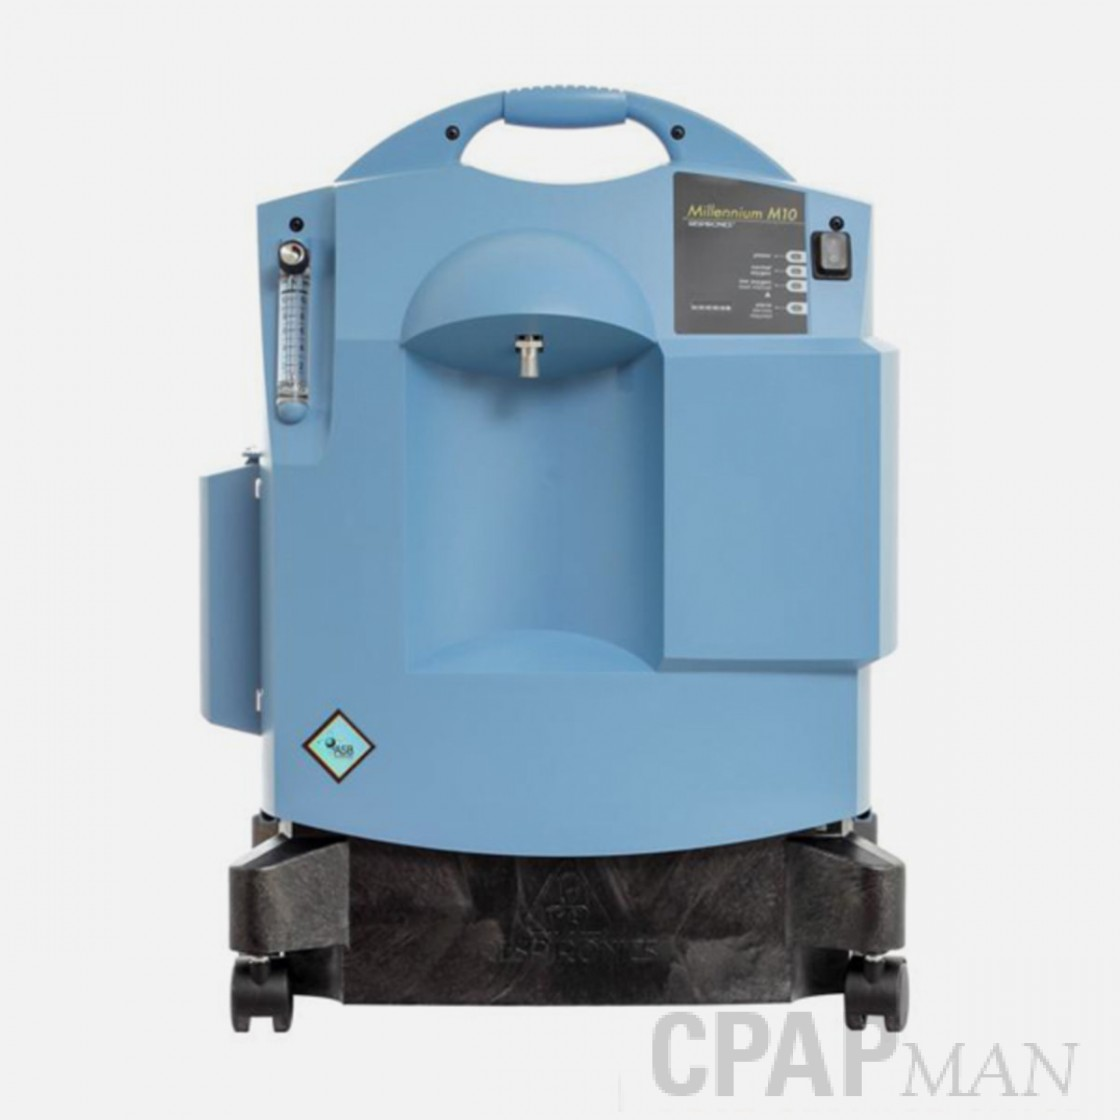 Philips Millennium M10 10 Liters Oxygen Concentrator